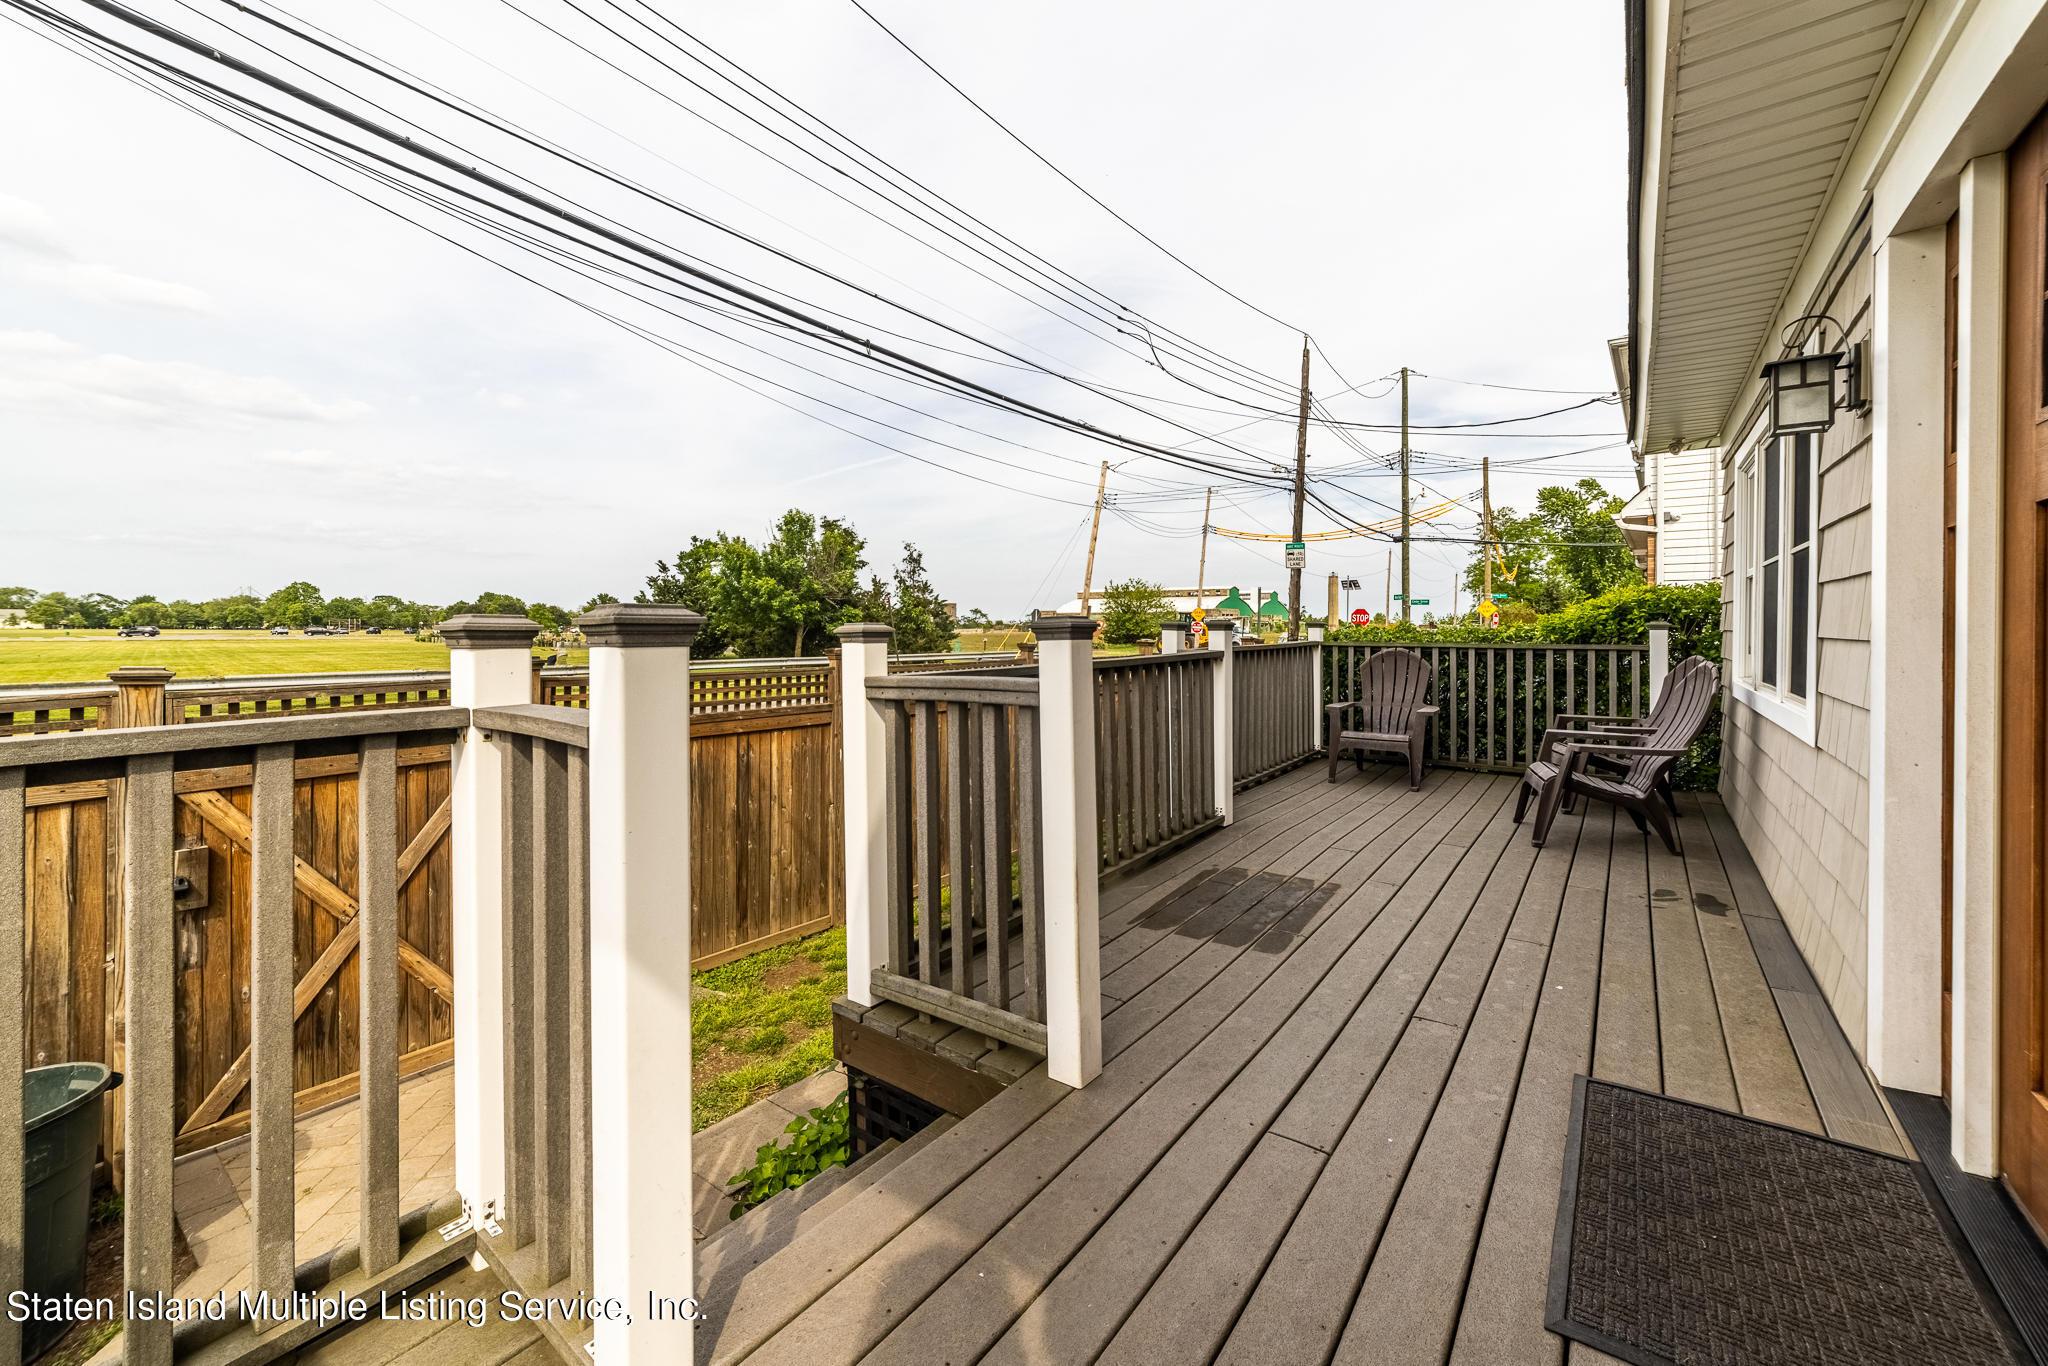 Single Family - Detached 790 New Dorp Lane  Staten Island, NY 10306, MLS-1146574-30